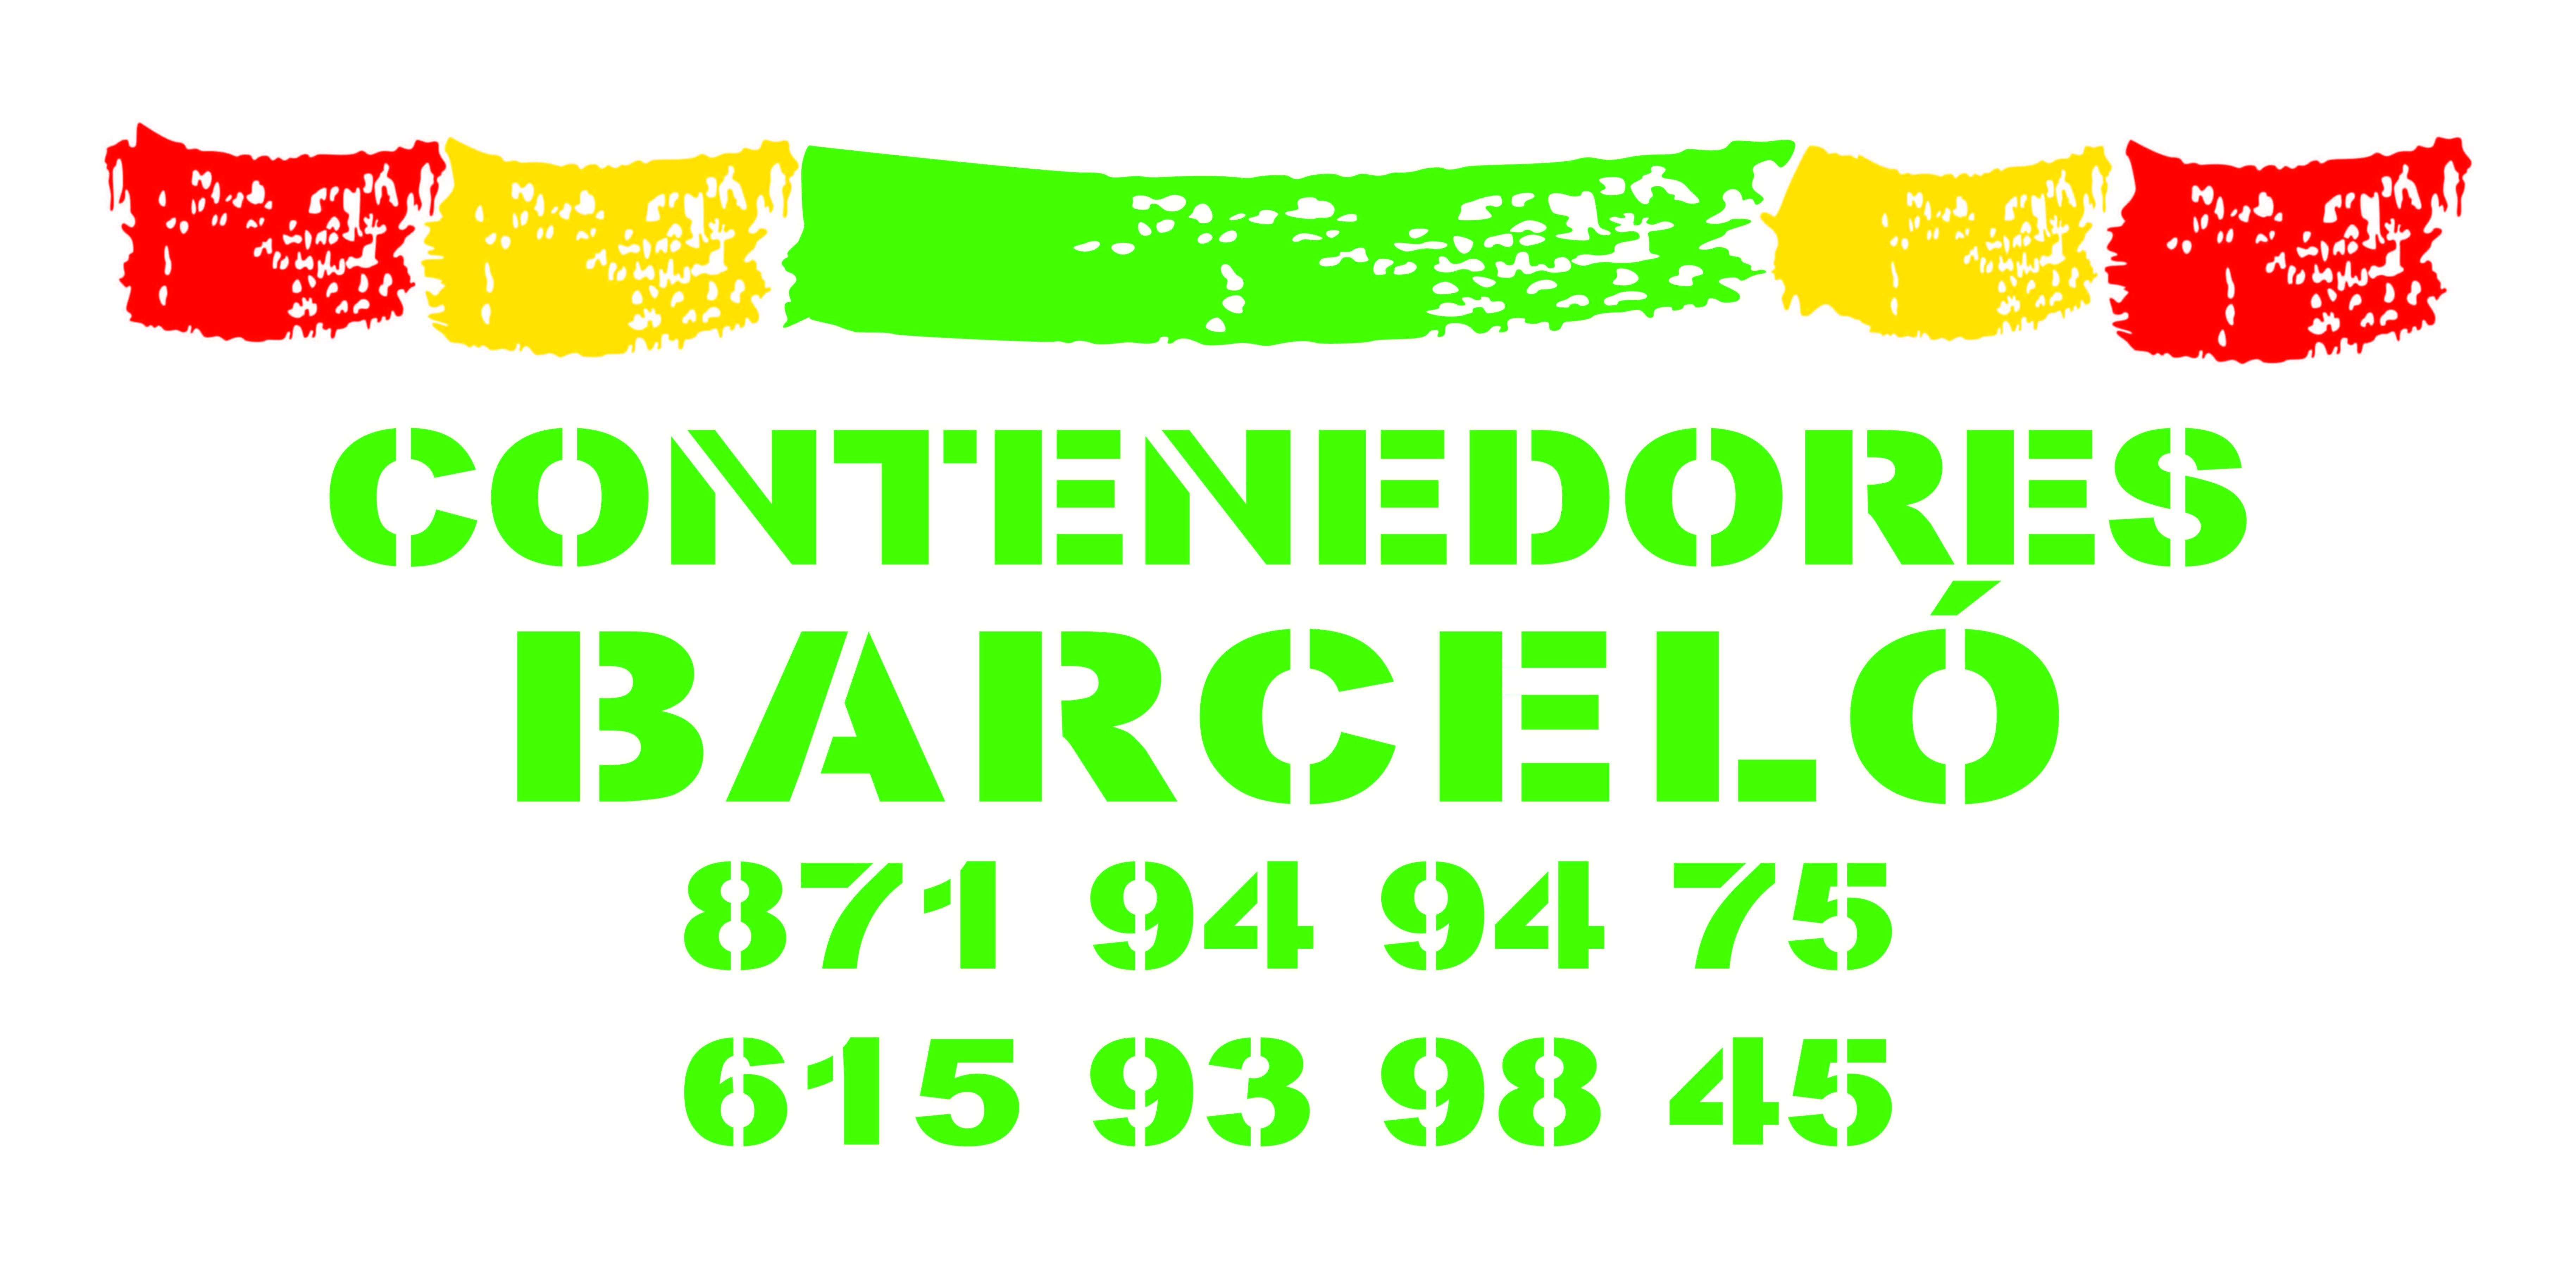 Foto 22 de Alquiler de contenedores en Palma | Contenedores Barceló